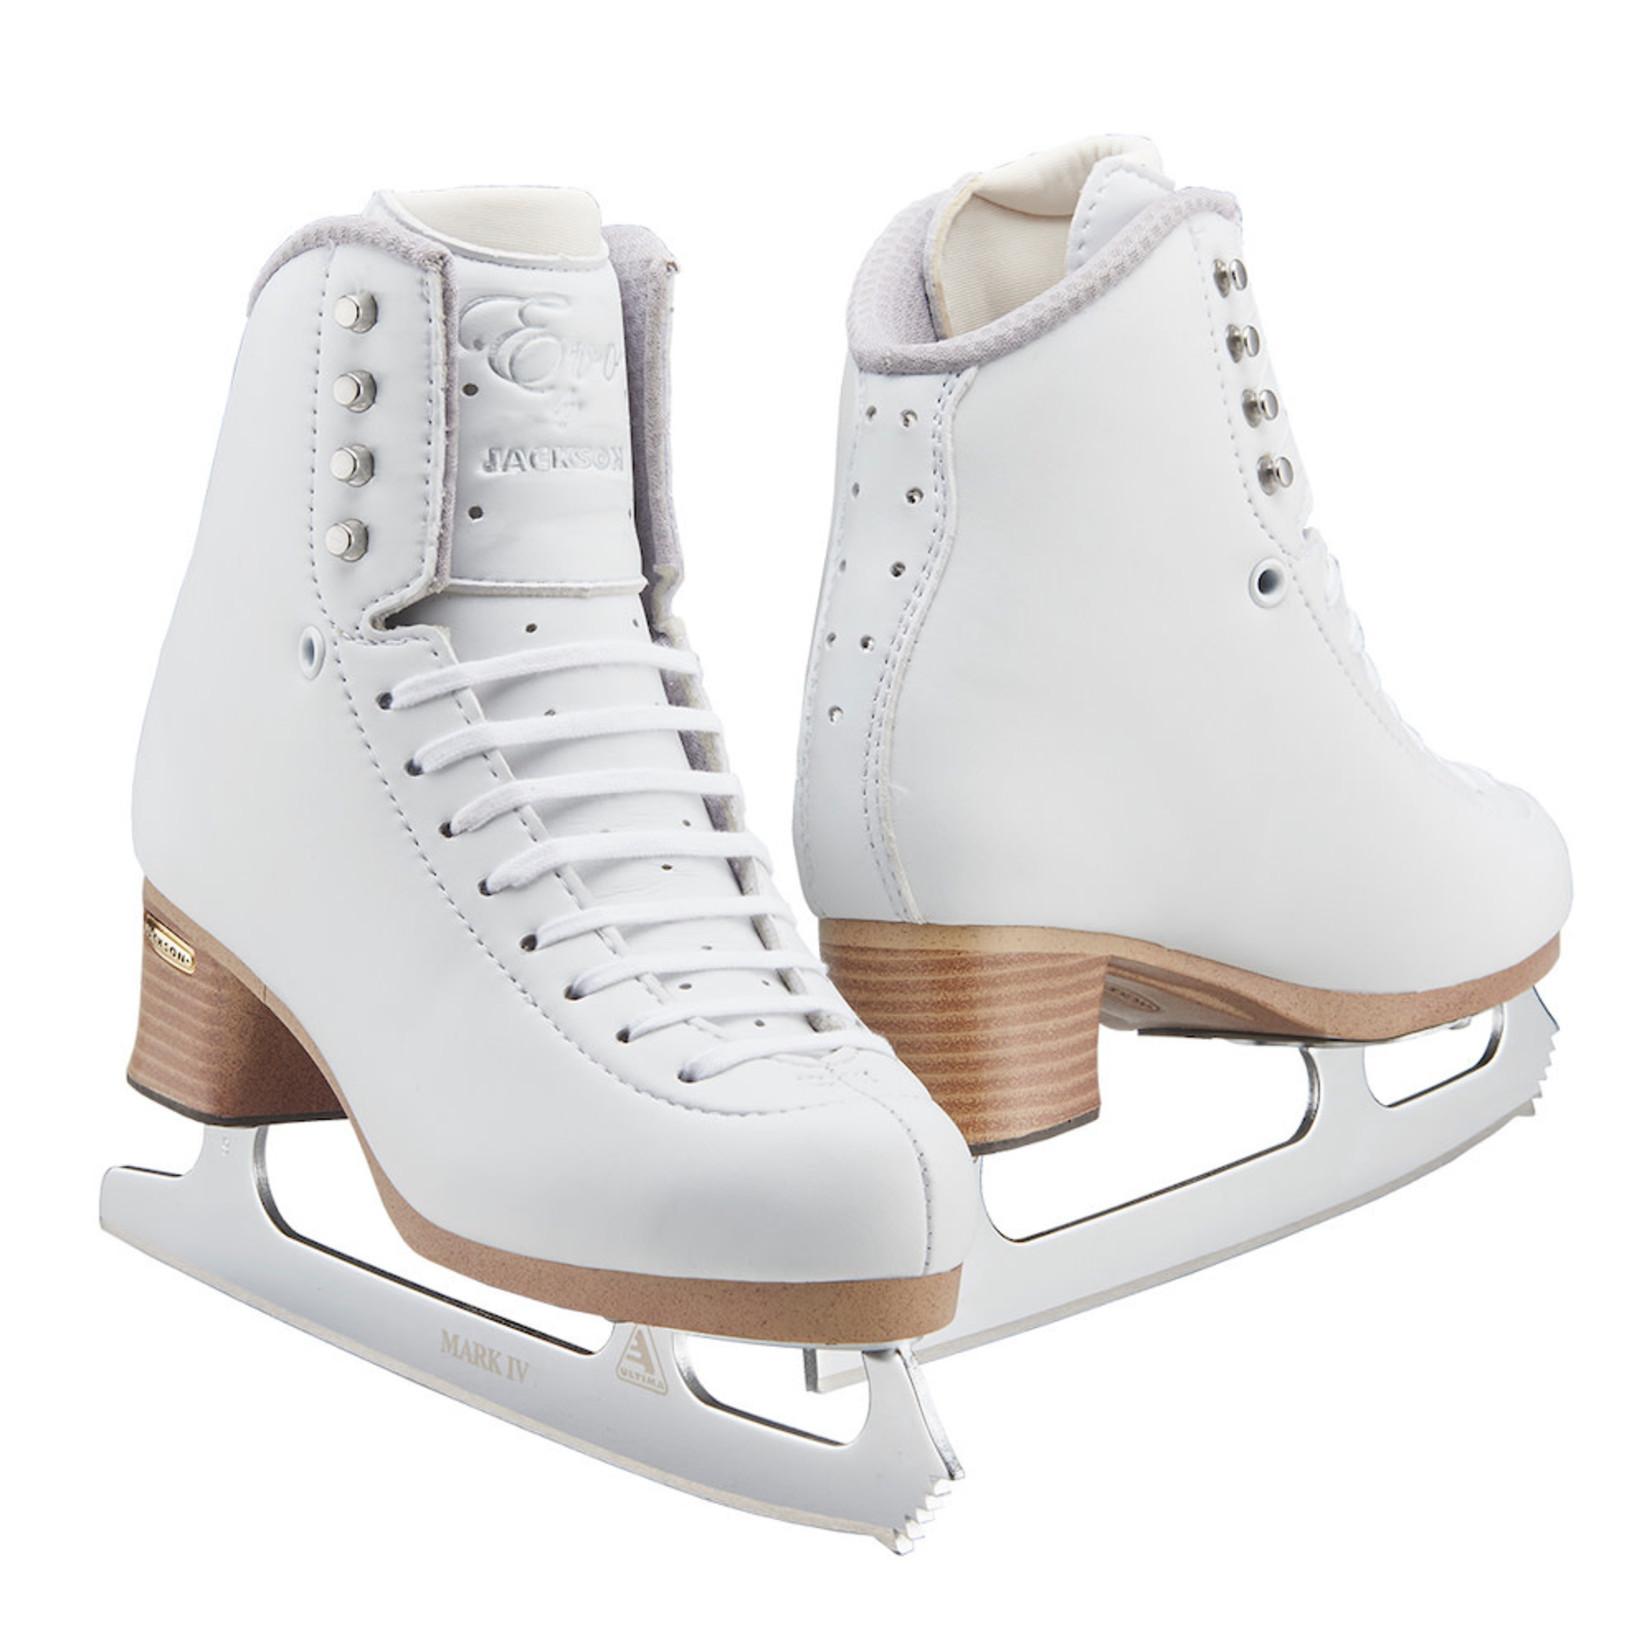 Jackson Jackson Figure Skates, Evo Fusion FS2020, Ladies